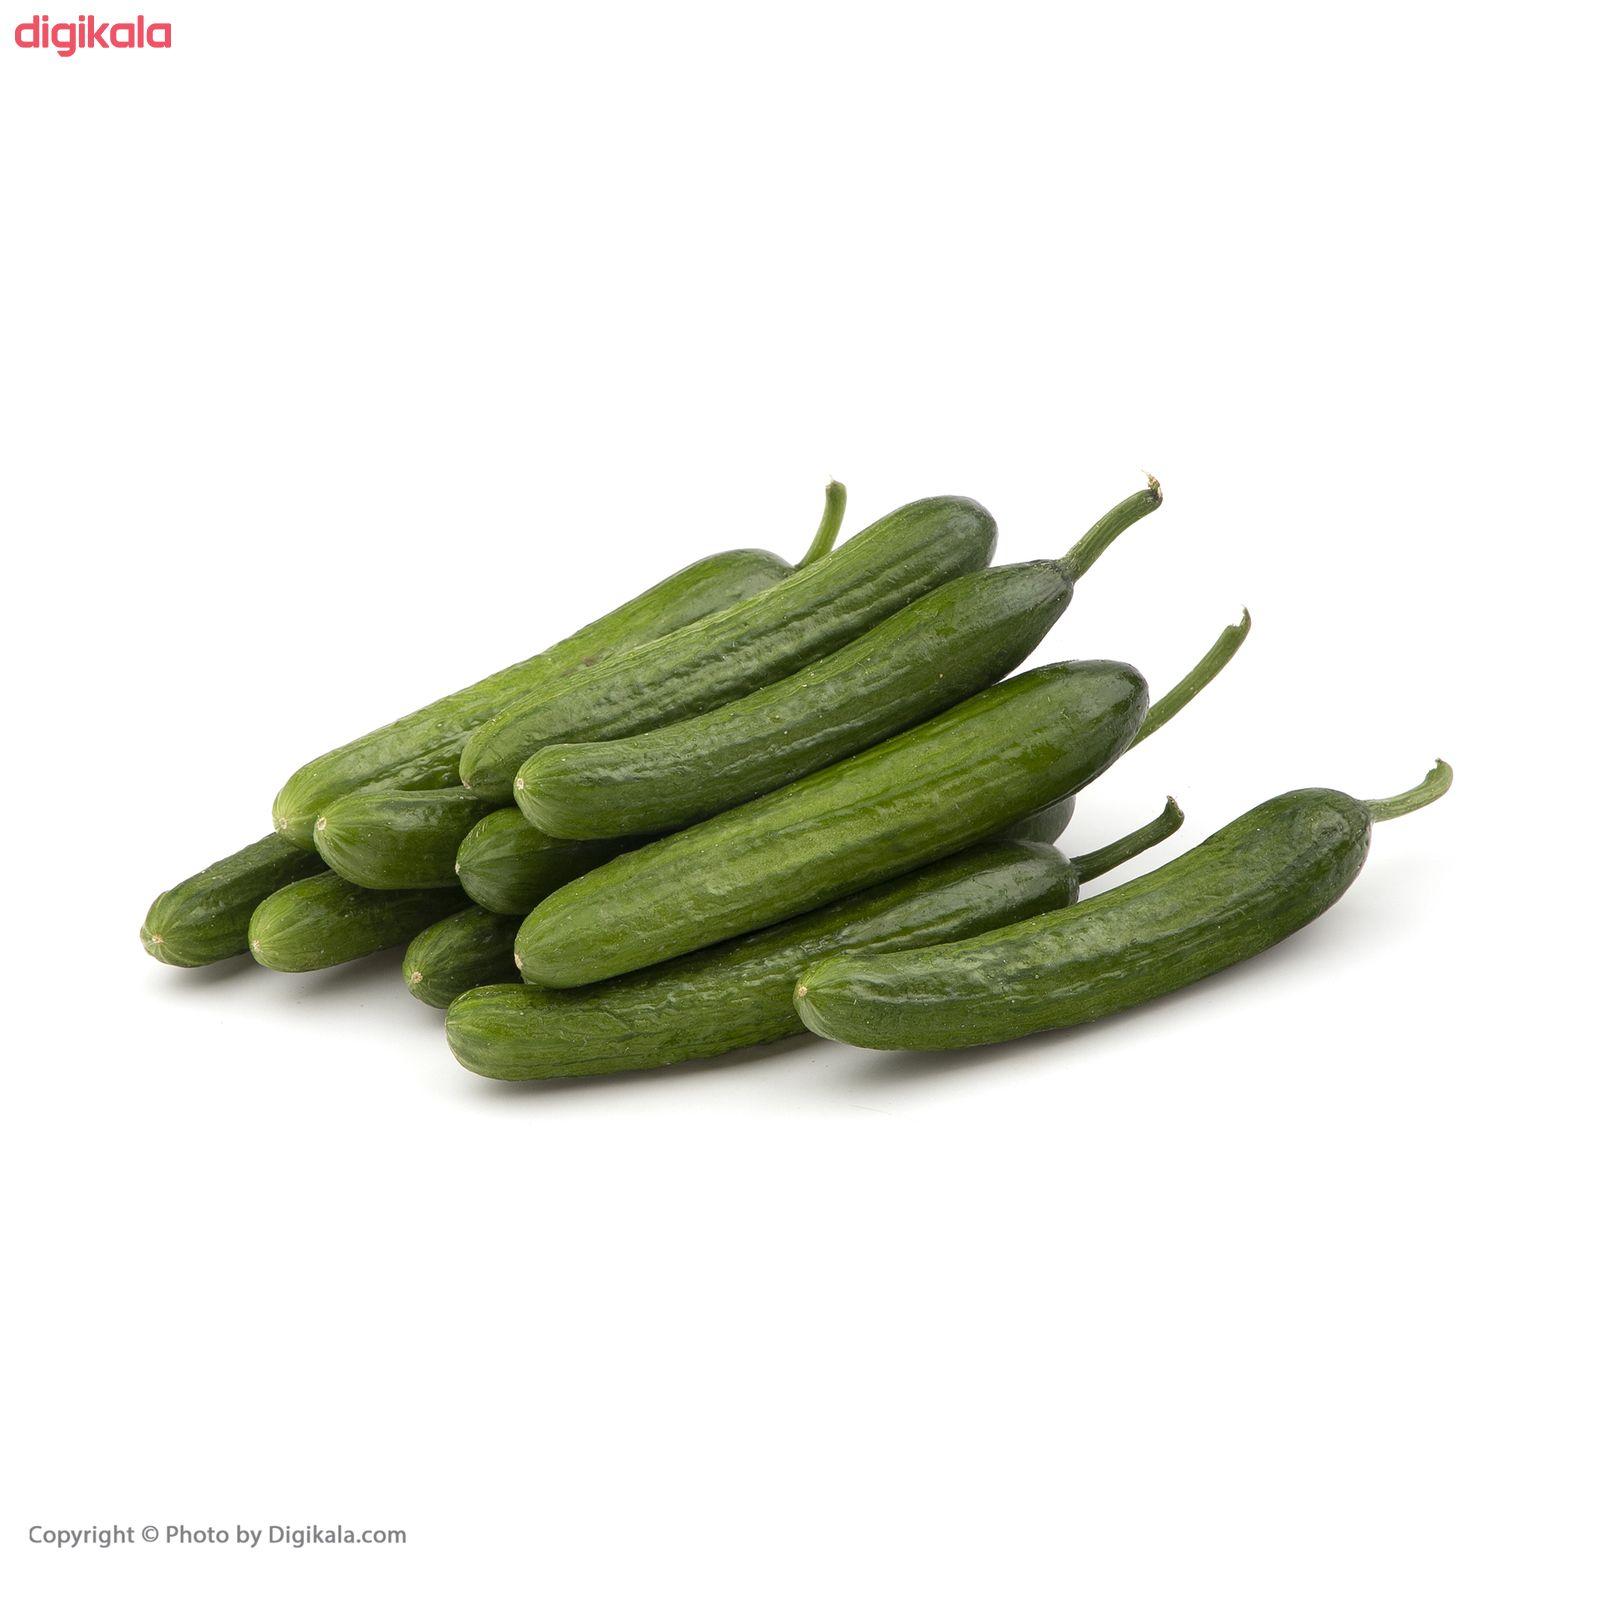 خیار گلخانهای فله - 1 کیلوگرم main 1 2